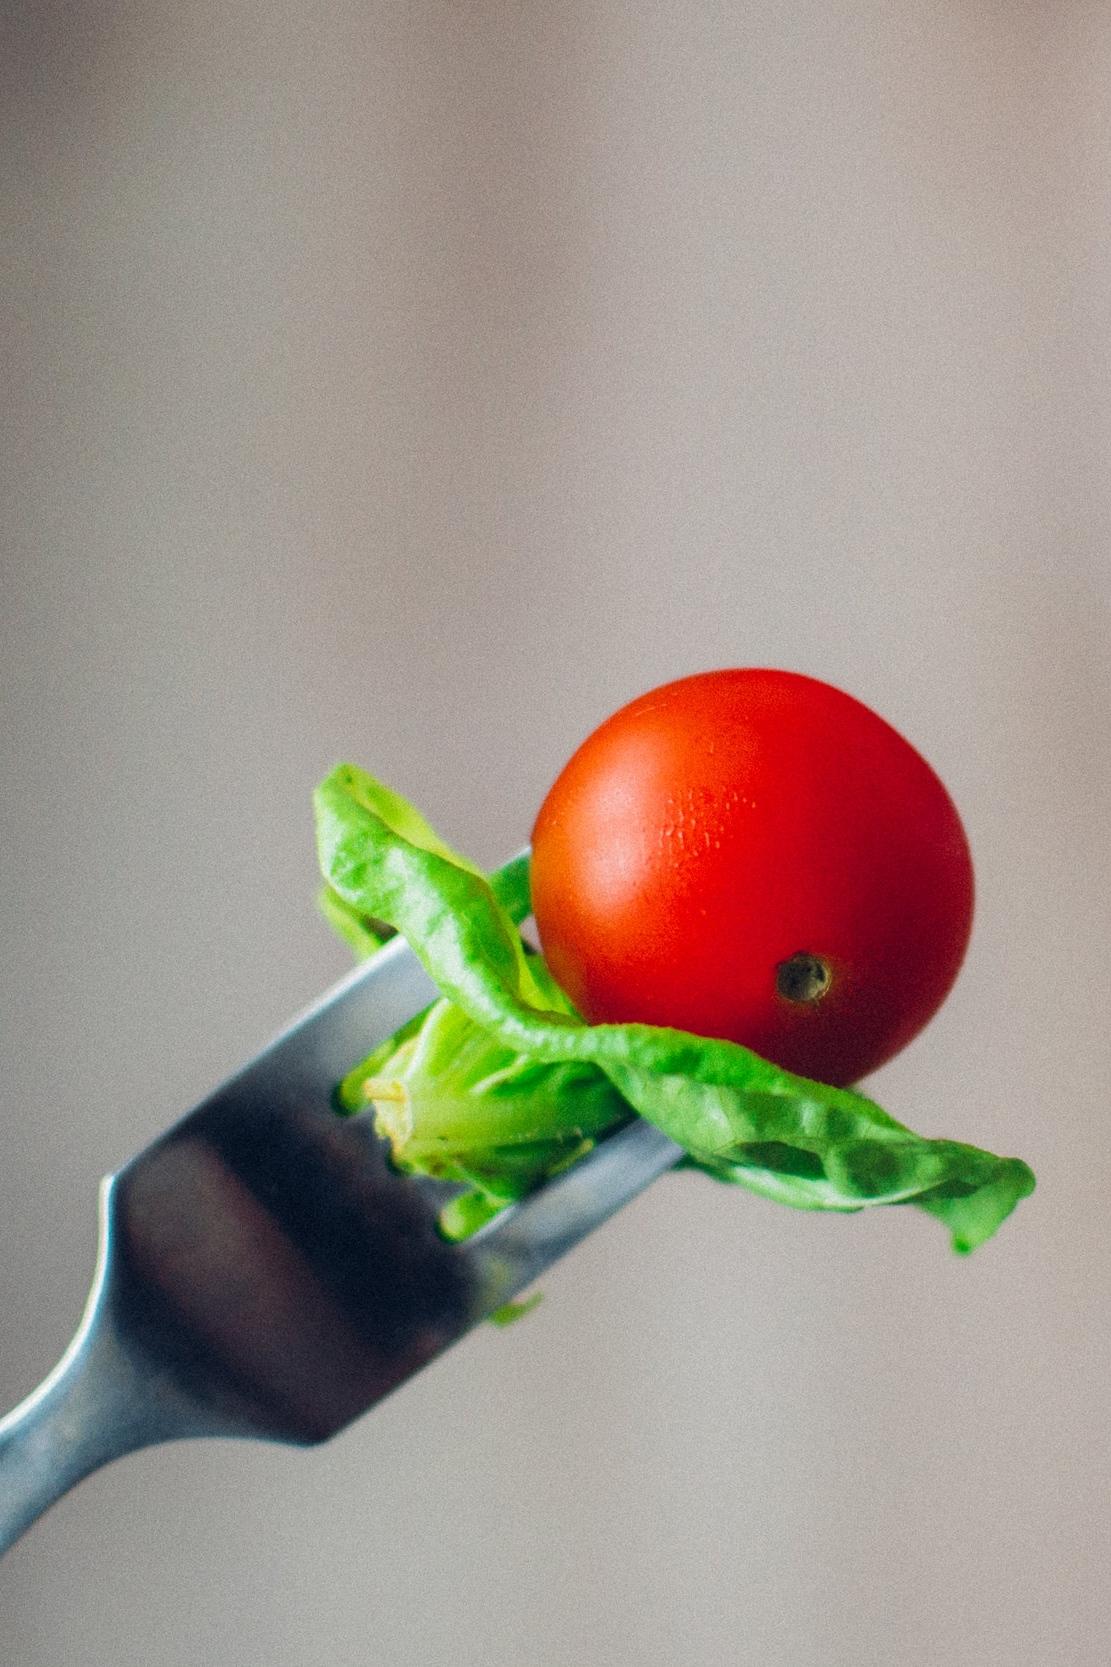 food-tomato-1.jpg